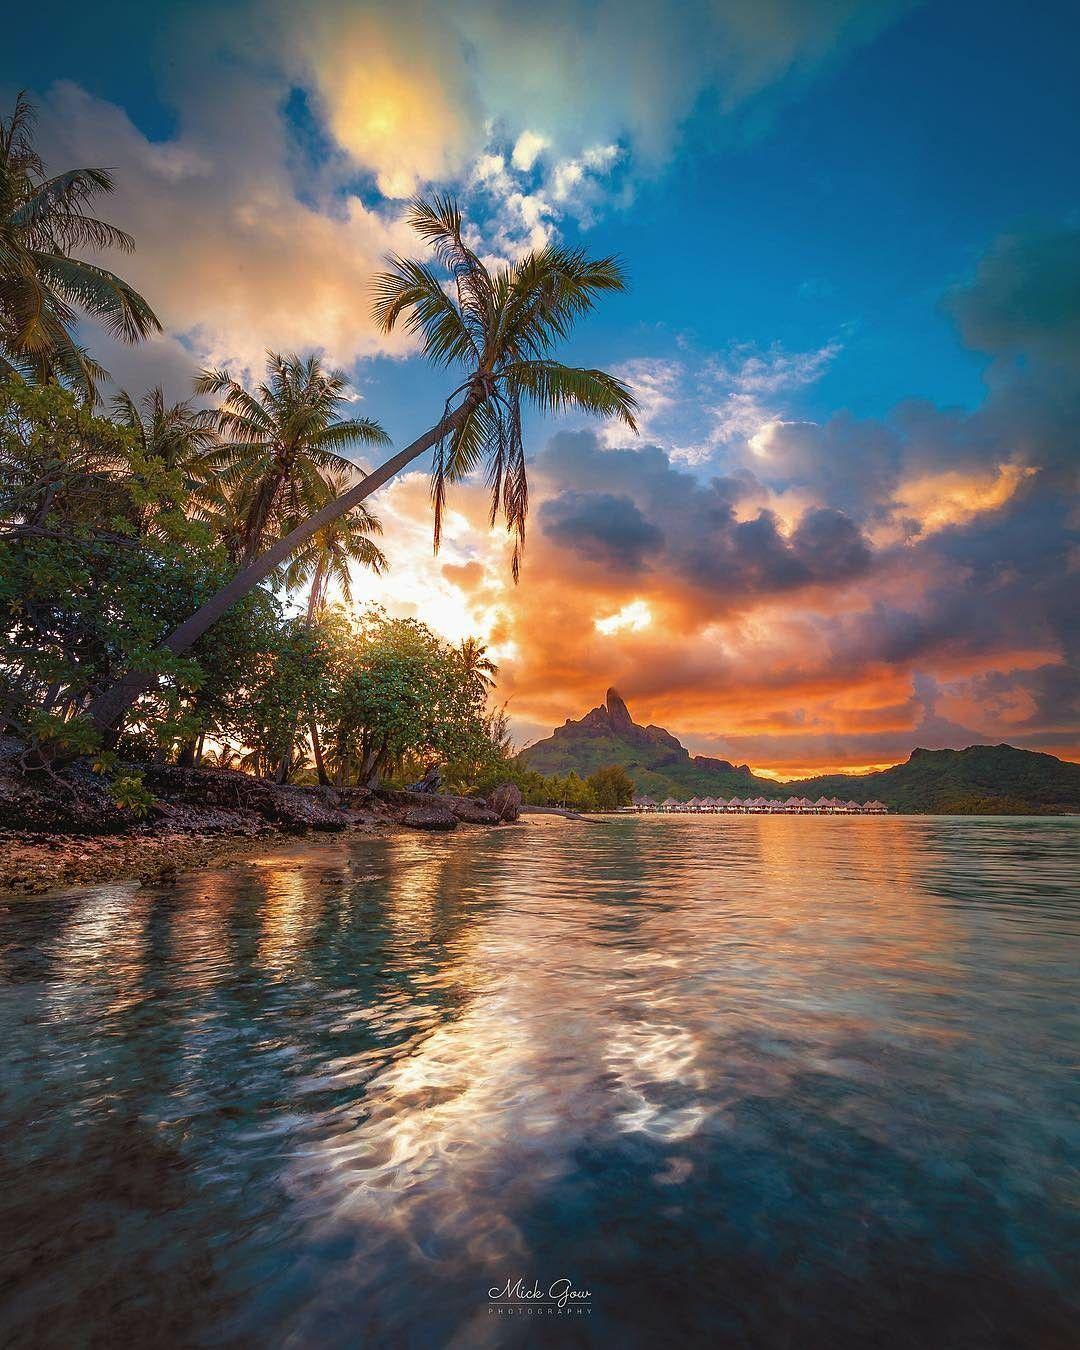 Hawaiian Sunset Beautifulnature Naturephotography Nature Photography Sunset Reflections Travel Hawaii 풍경 사진 해변 사진 경치